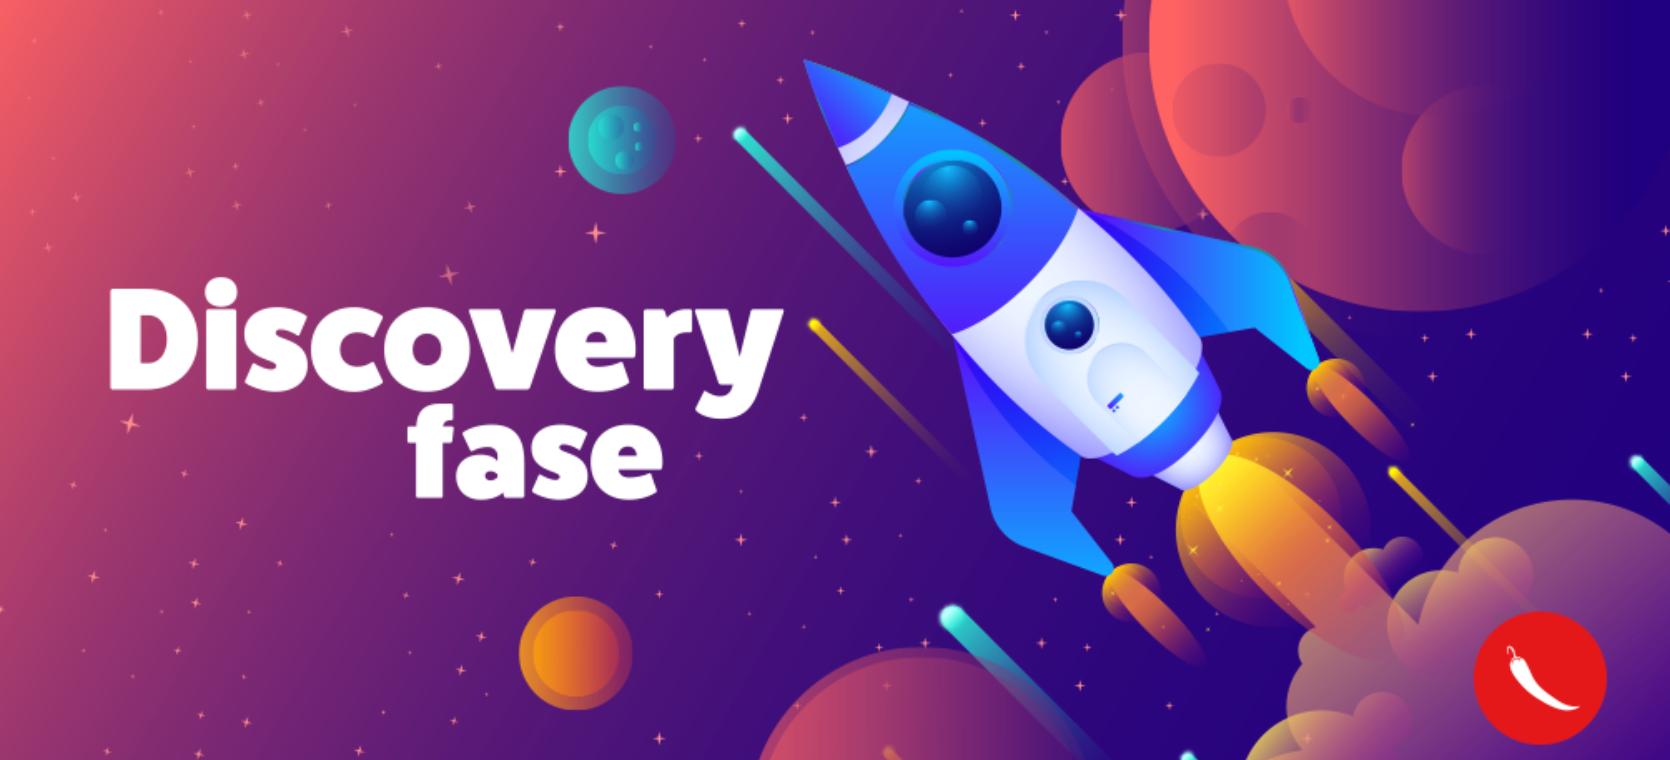 Headers 1004px website ketjapp discovery fase